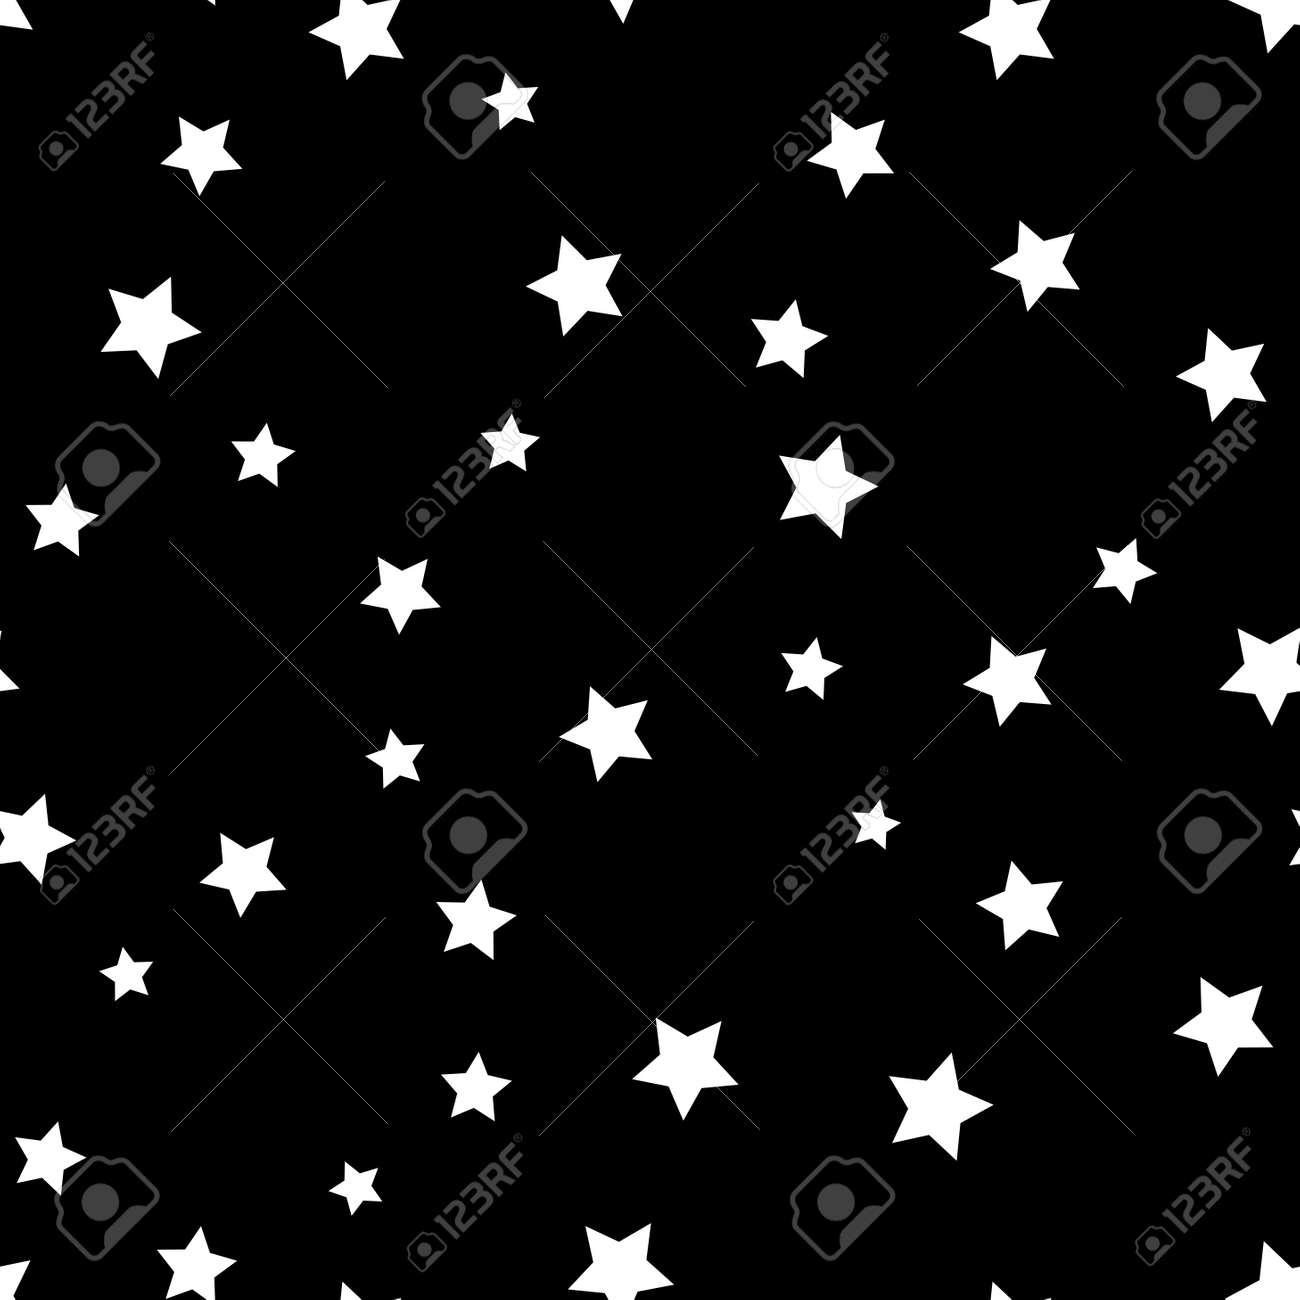 Modelo De Estrella Sin Fisuras. Fondo Retro Blanco Y Negro ...